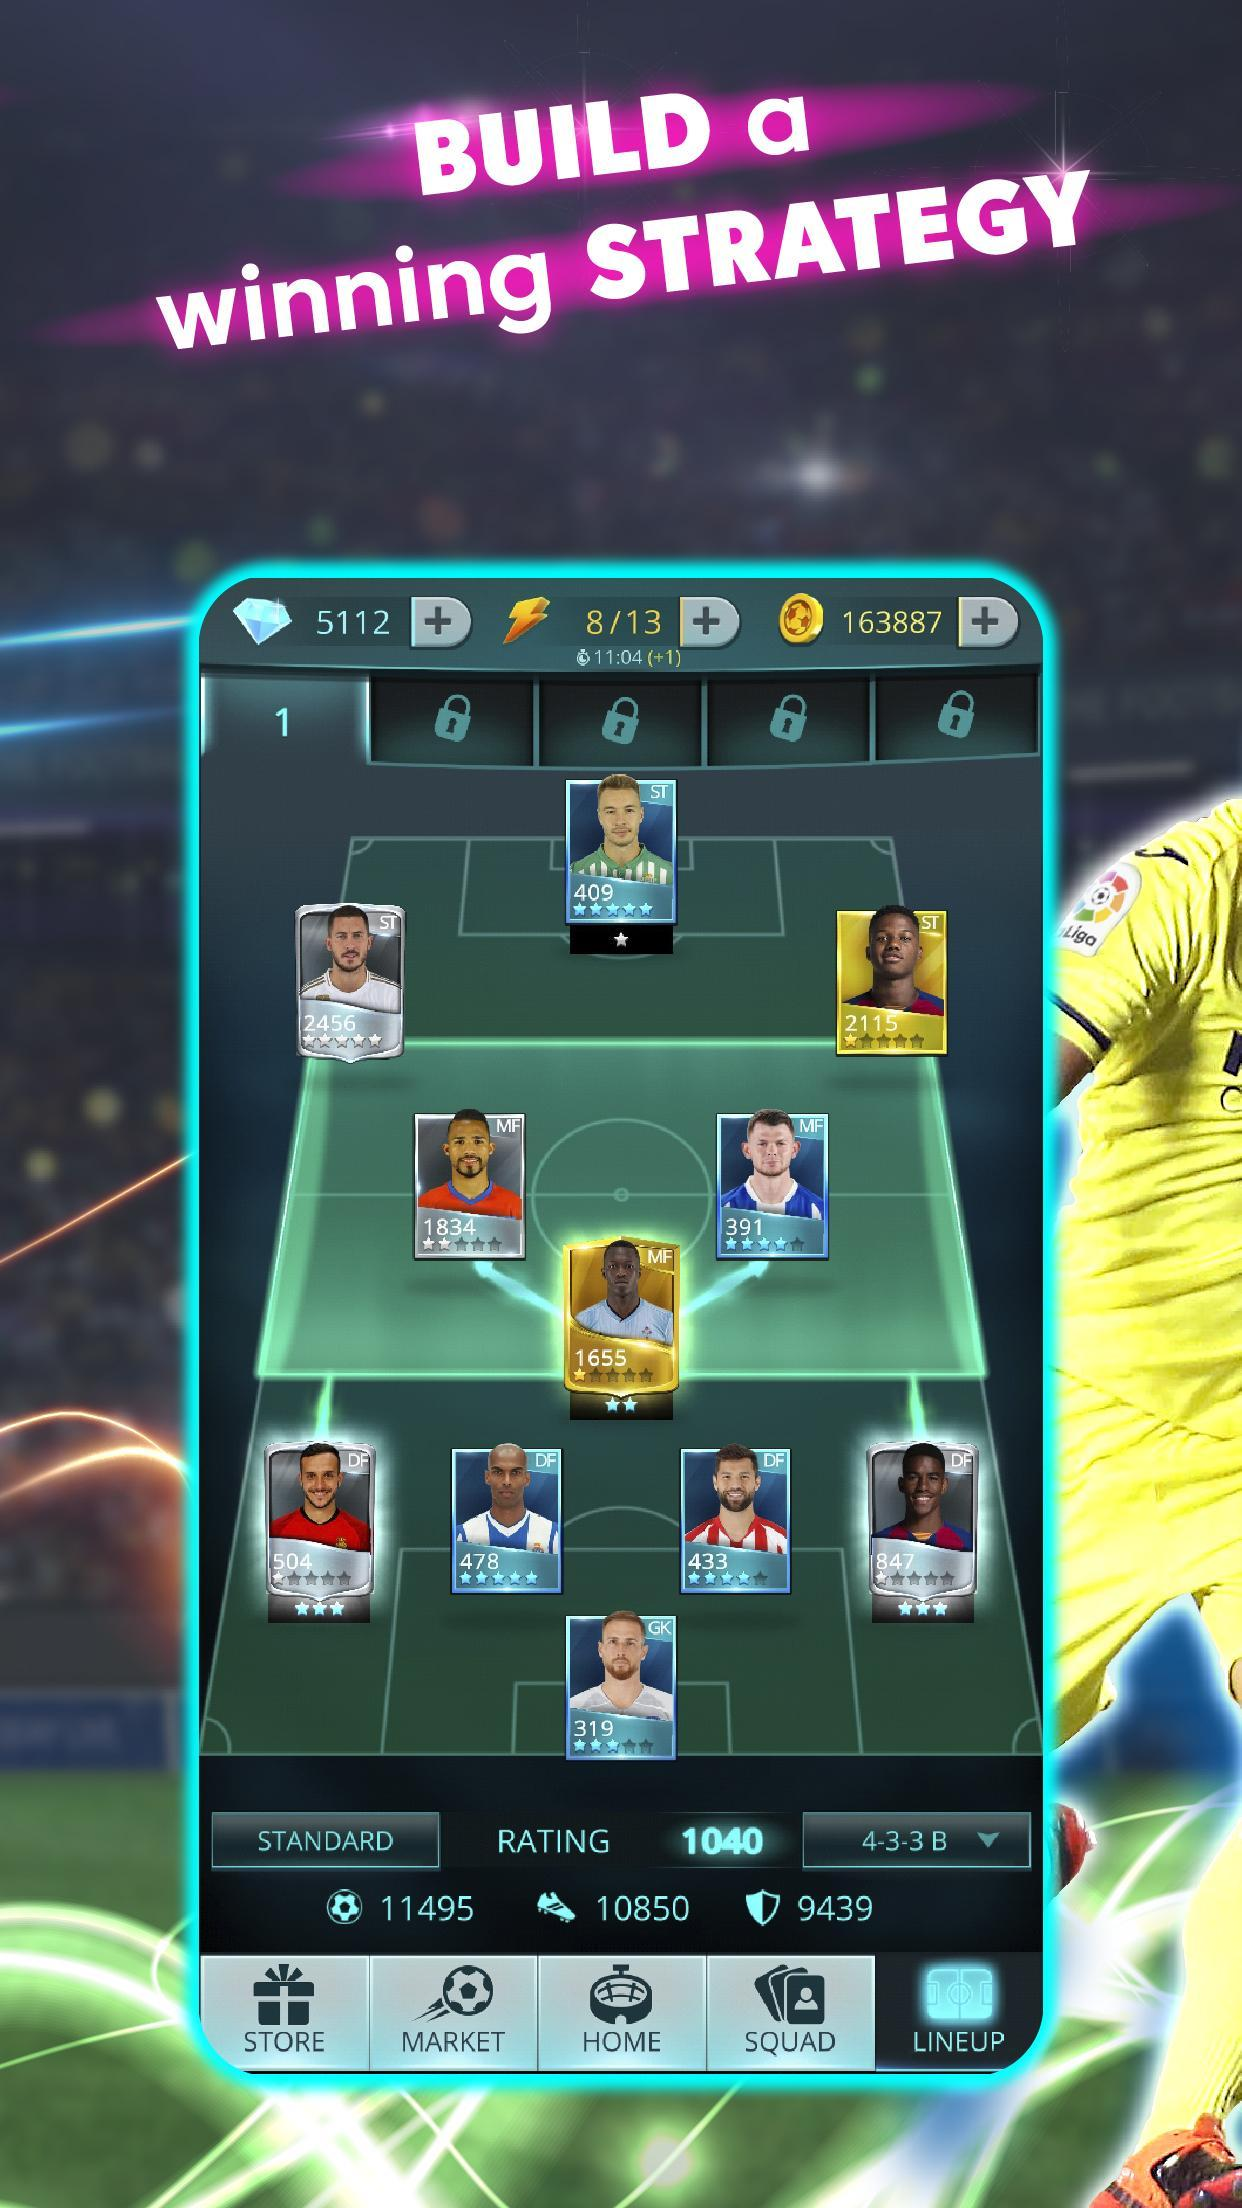 LaLiga Top Cards 2020 - Soccer Card Battle Game 4.1.4 Screenshot 6